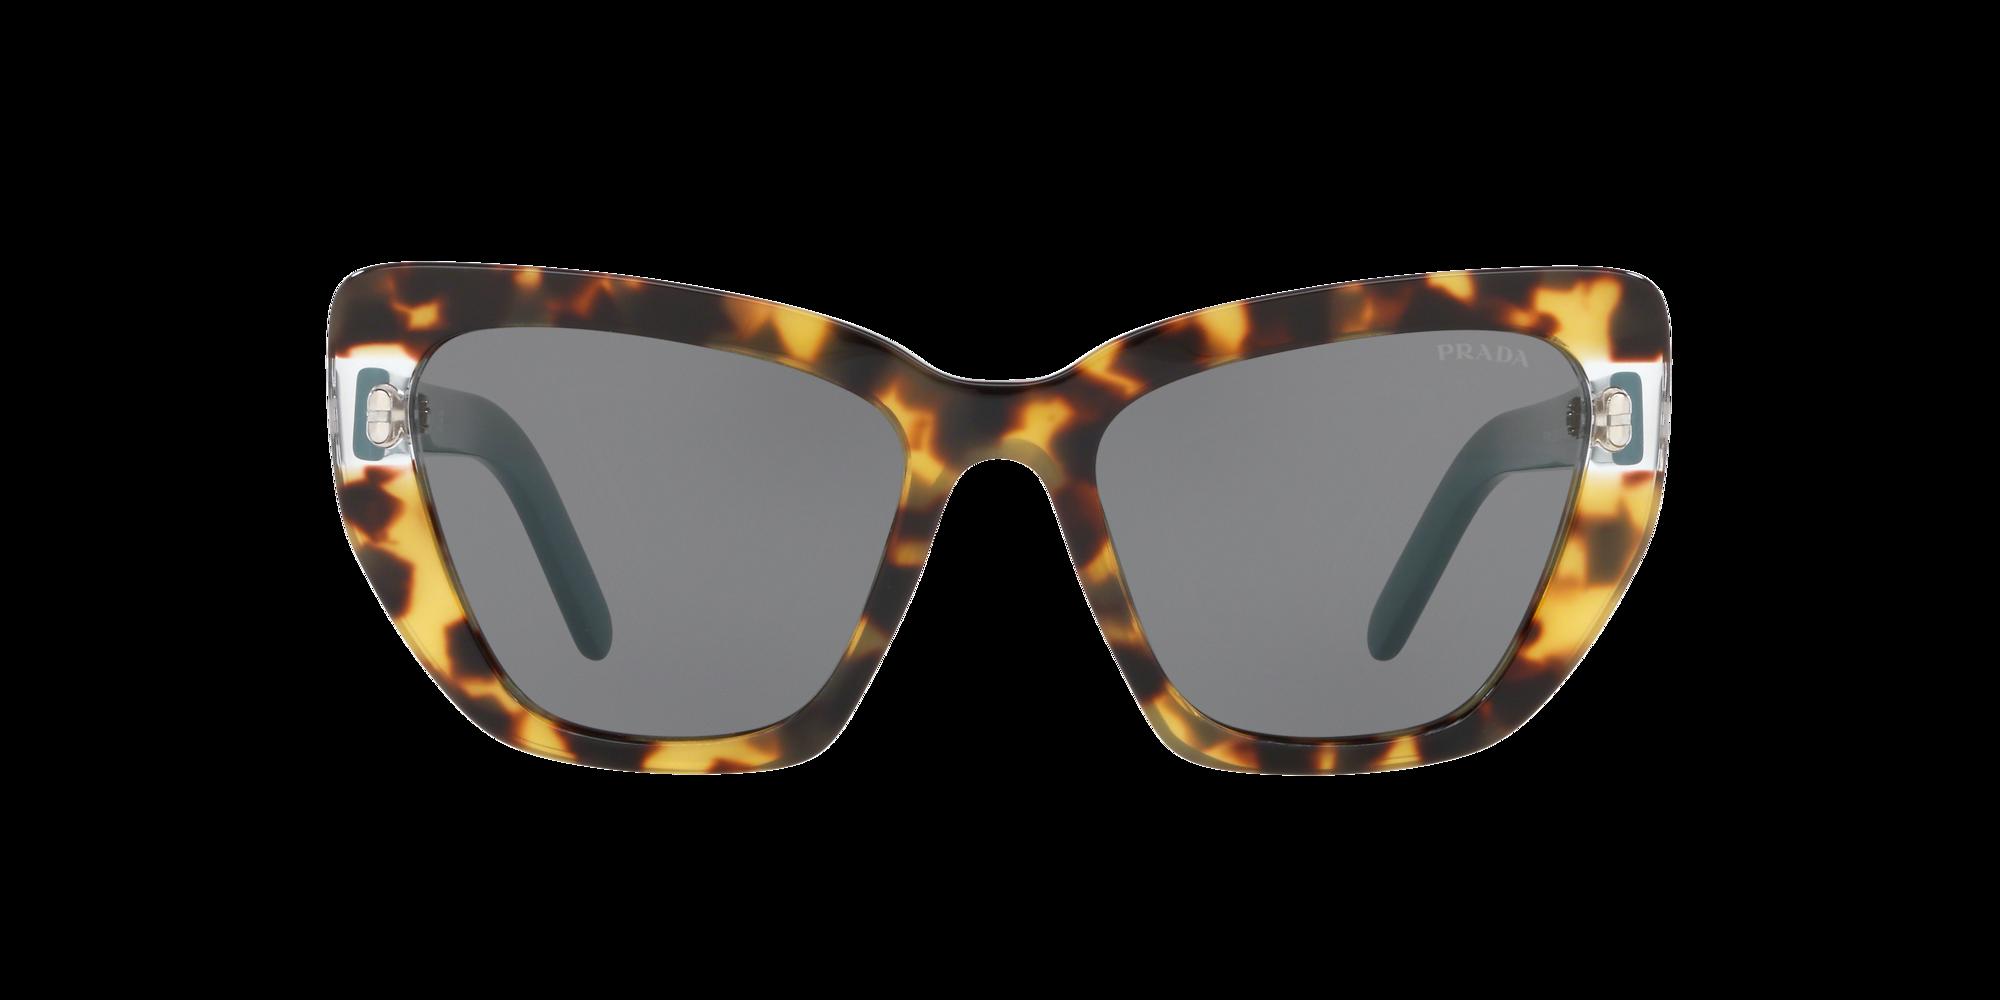 Image for PR 08VS 55 CATWALK from LensCrafters | Glasses, Prescription Glasses Online, Eyewear